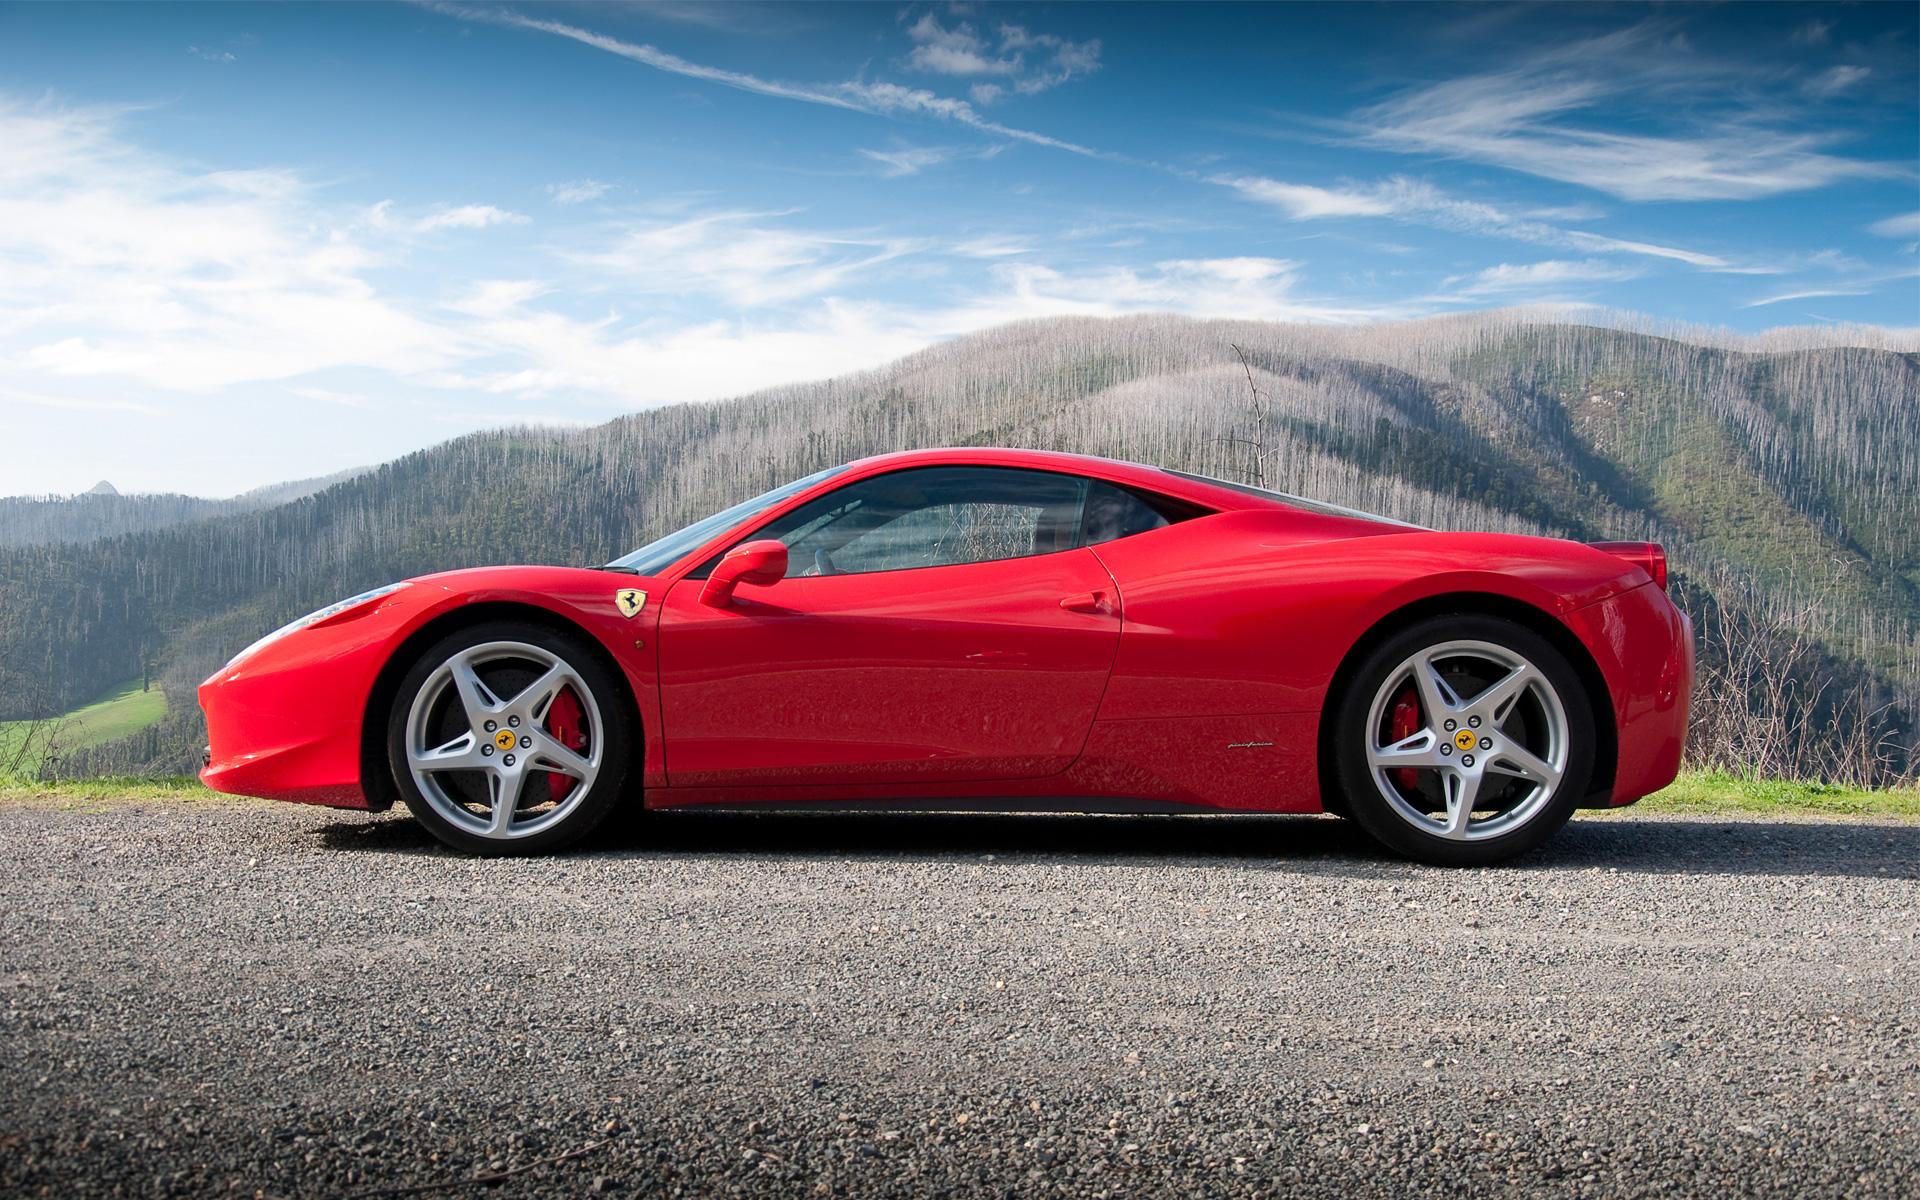 Drive the new Ferrari 458 Italia